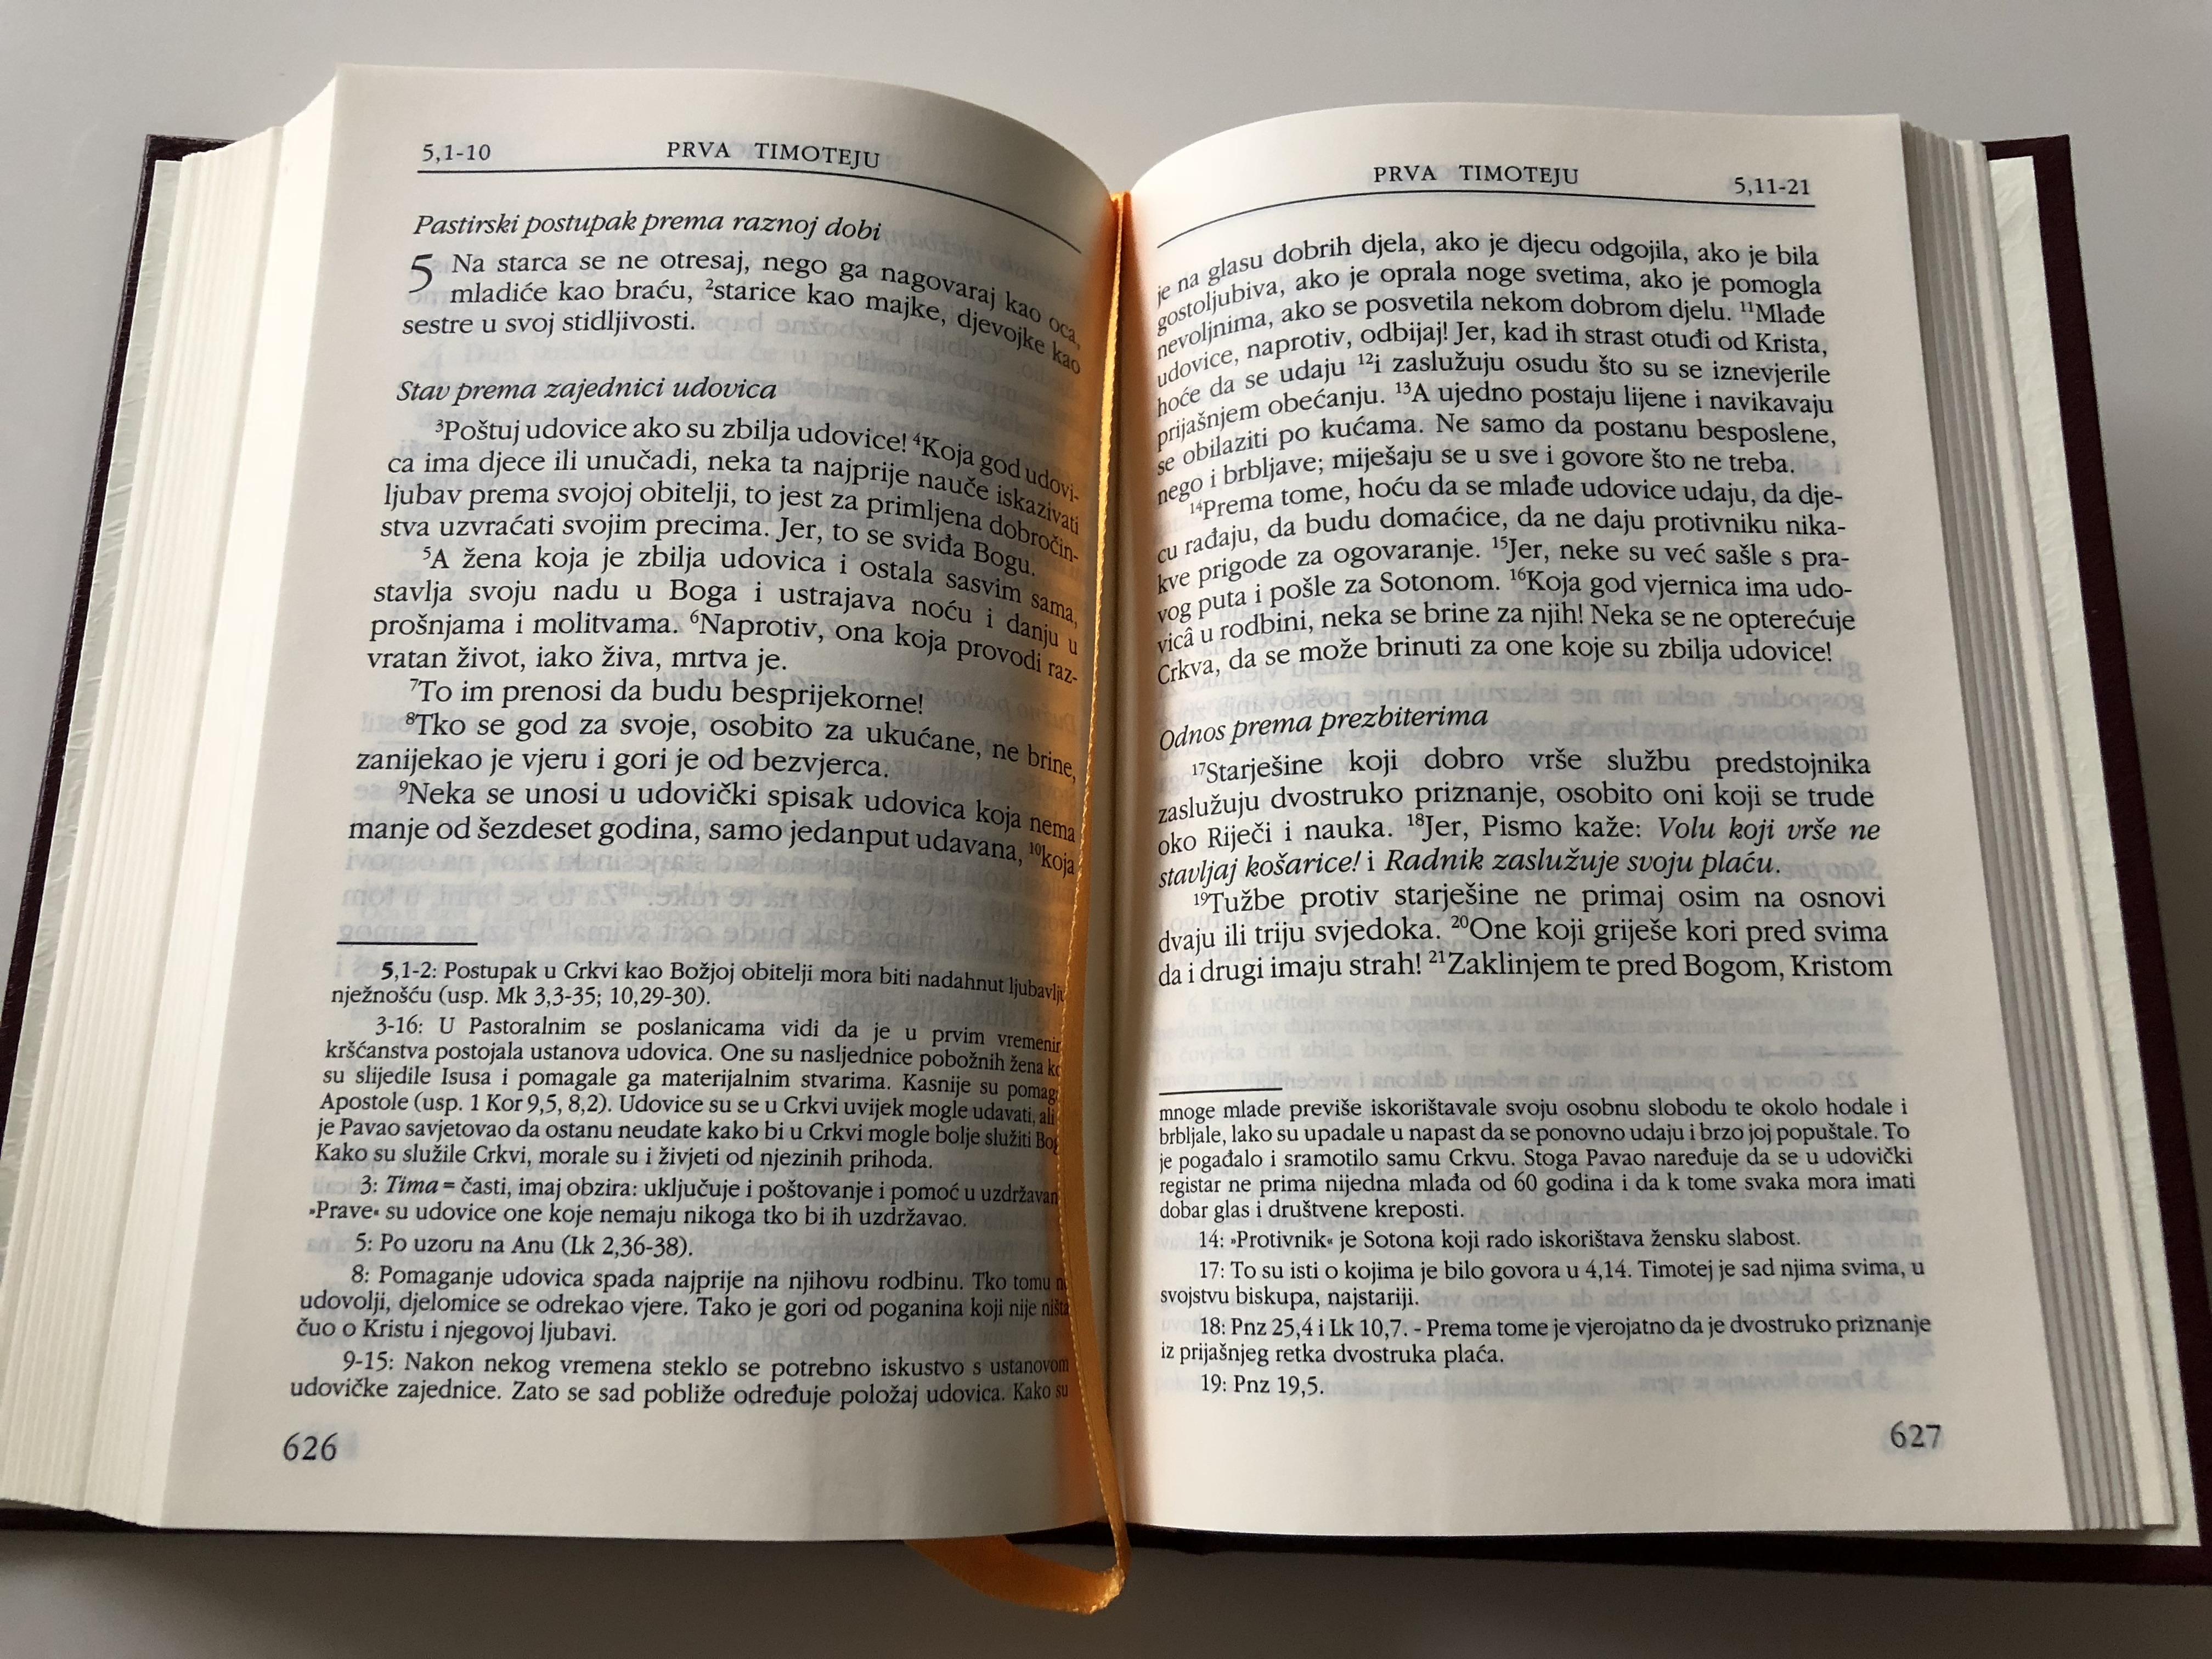 novi-zavjet-the-new-testament-in-croatian-language-hardcover-burgundy-hbd-2013-7-.jpg